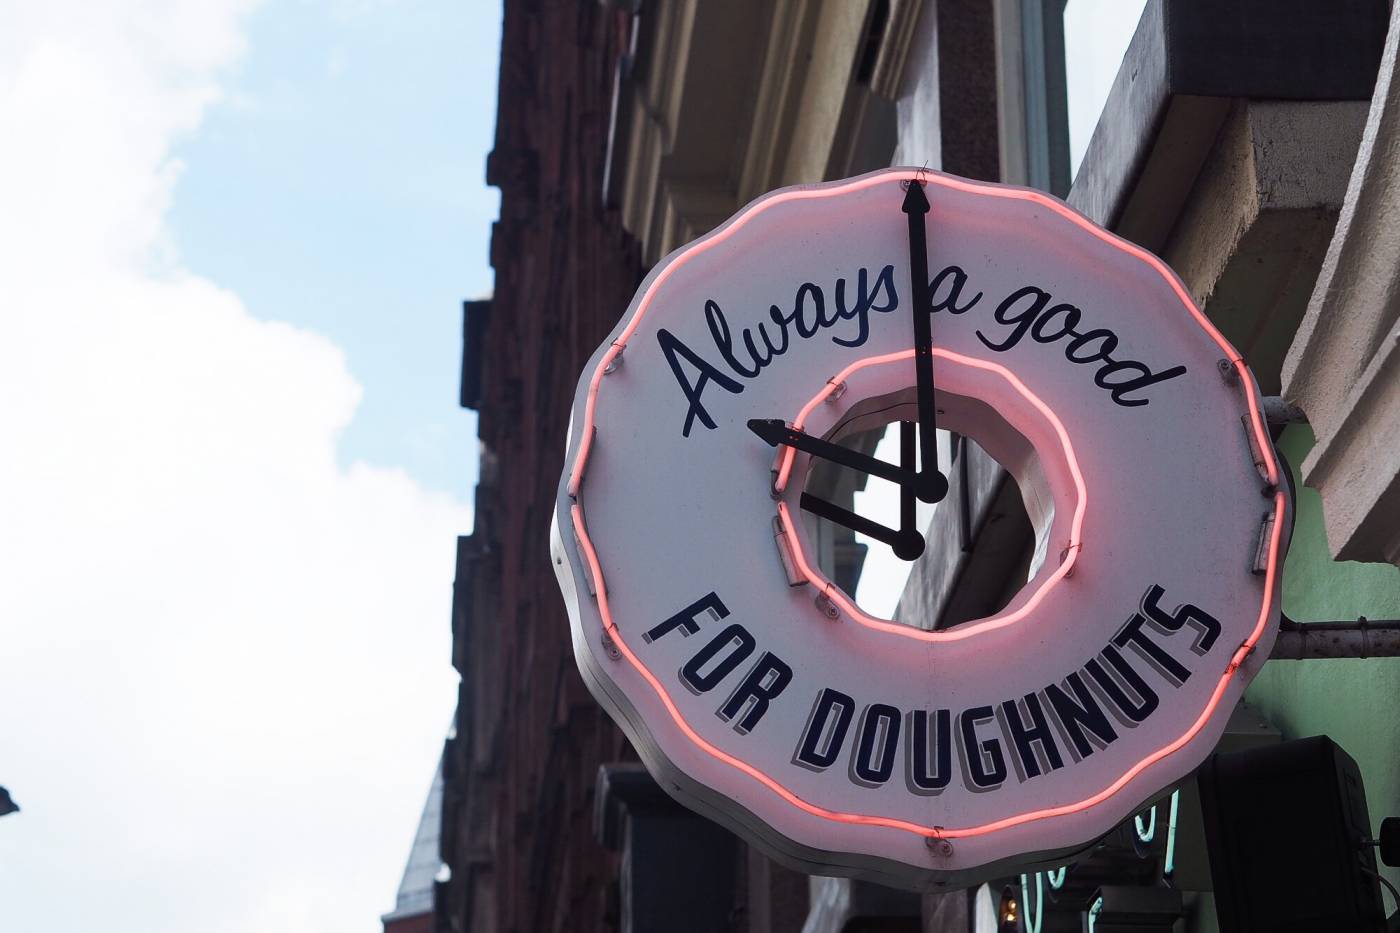 Doughnut_time_soho